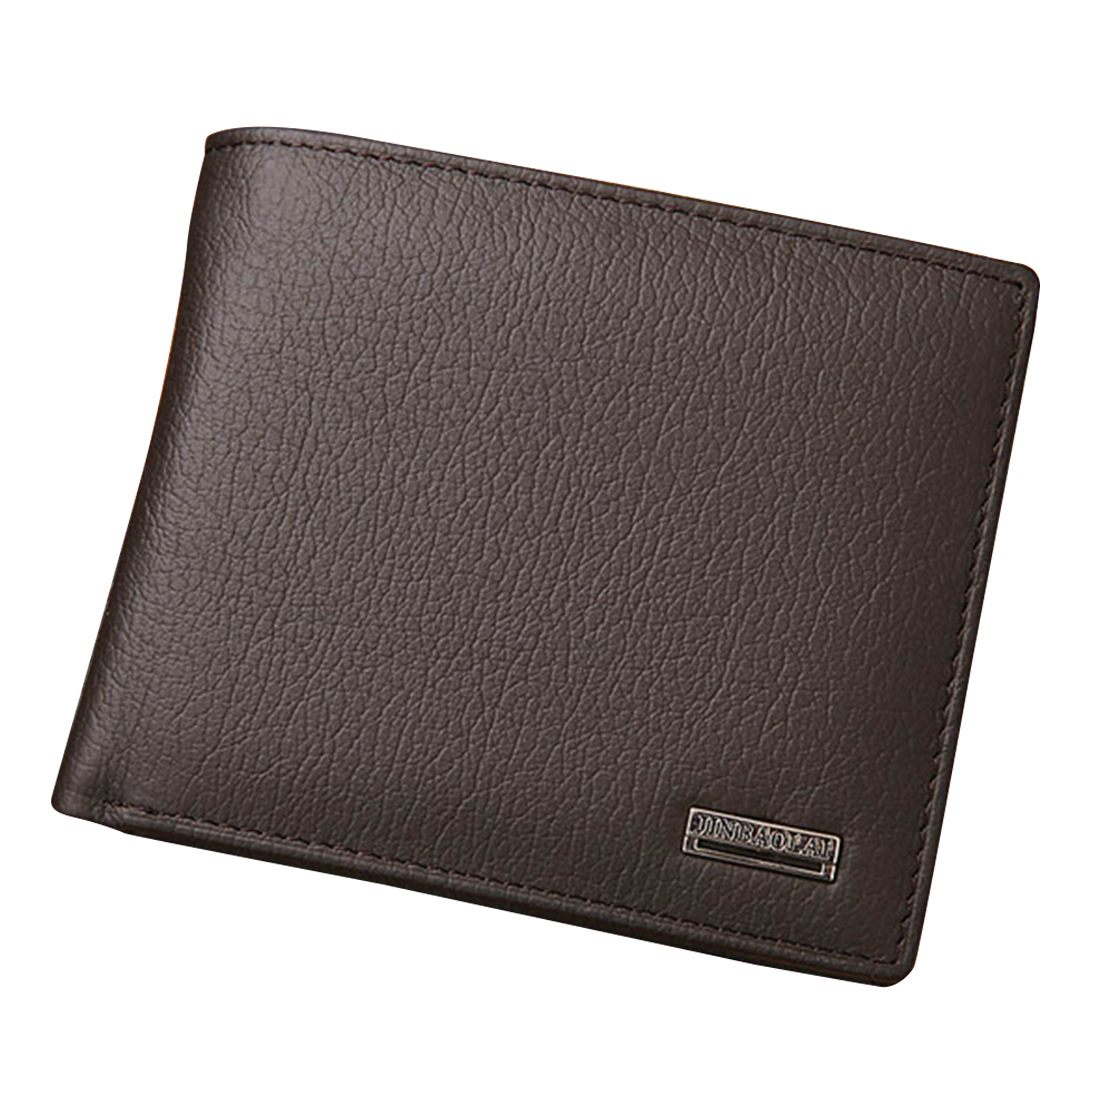 JINBAOLAI Small Short Leather Mens Wallet Male Wallet Bag Wallet Vallet Card Money Persian world Wallet